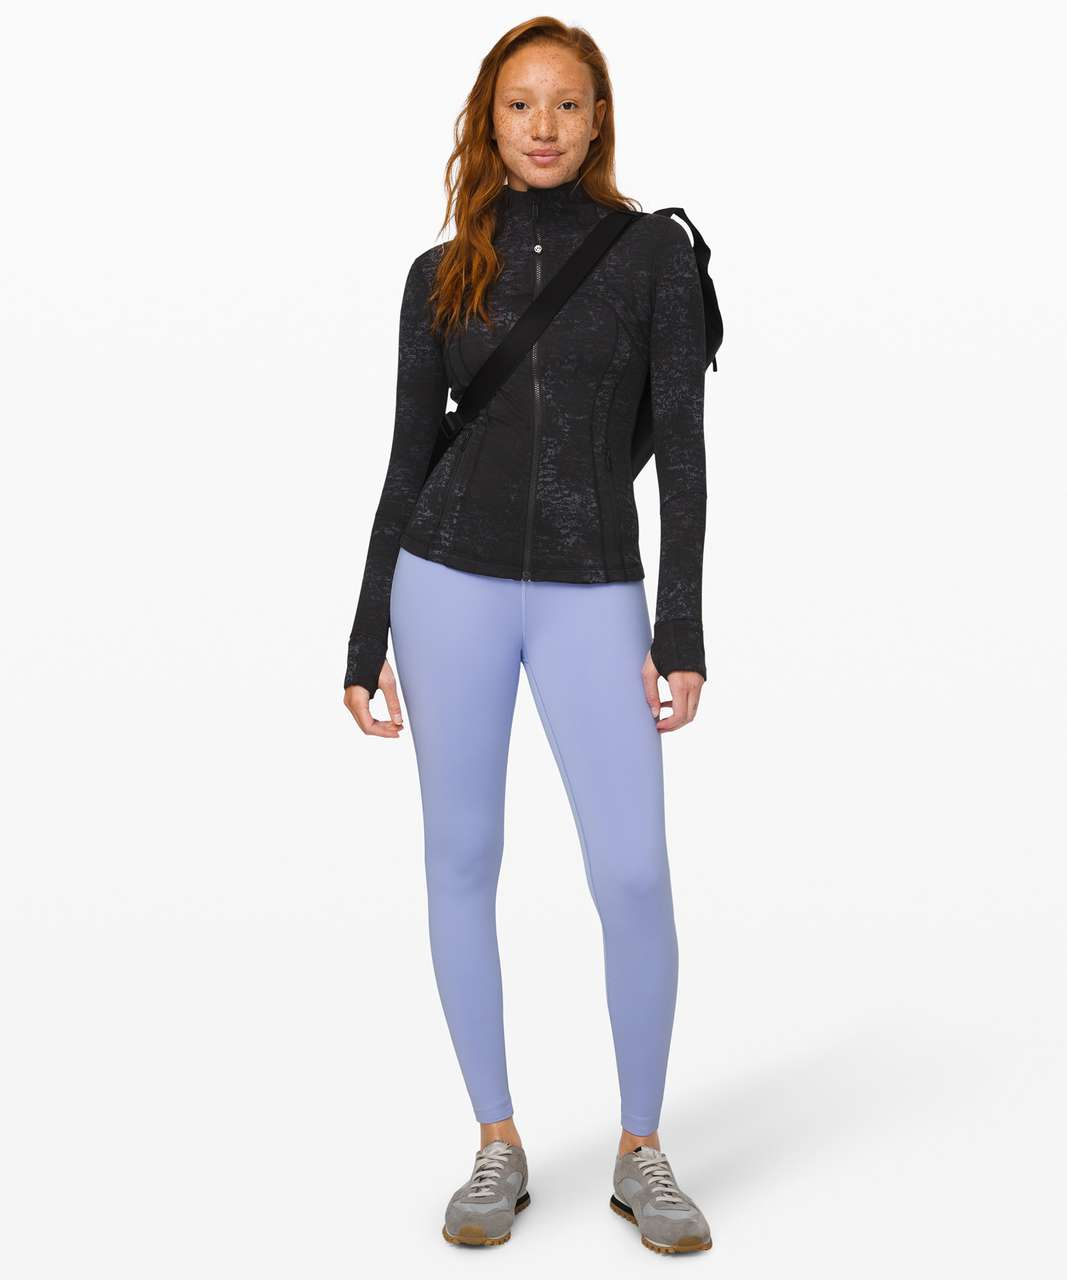 Lululemon Define Jacket *Luxtreme - Untamed Jacquard Spray Dye Black Deep Coal